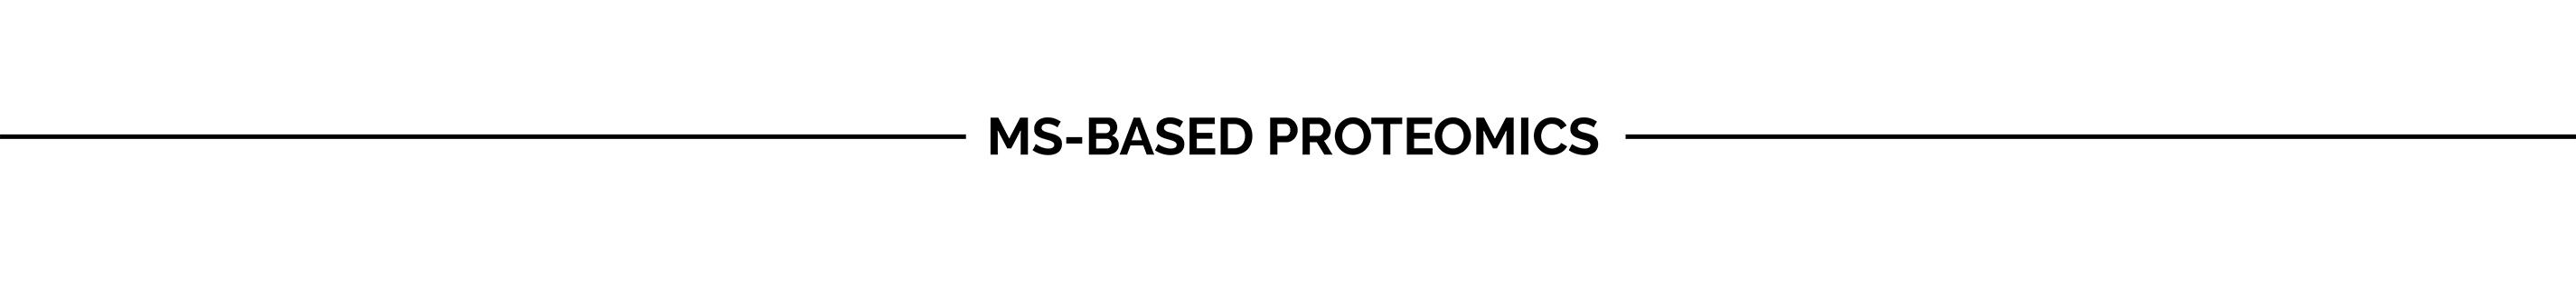 MS-based Proteomics